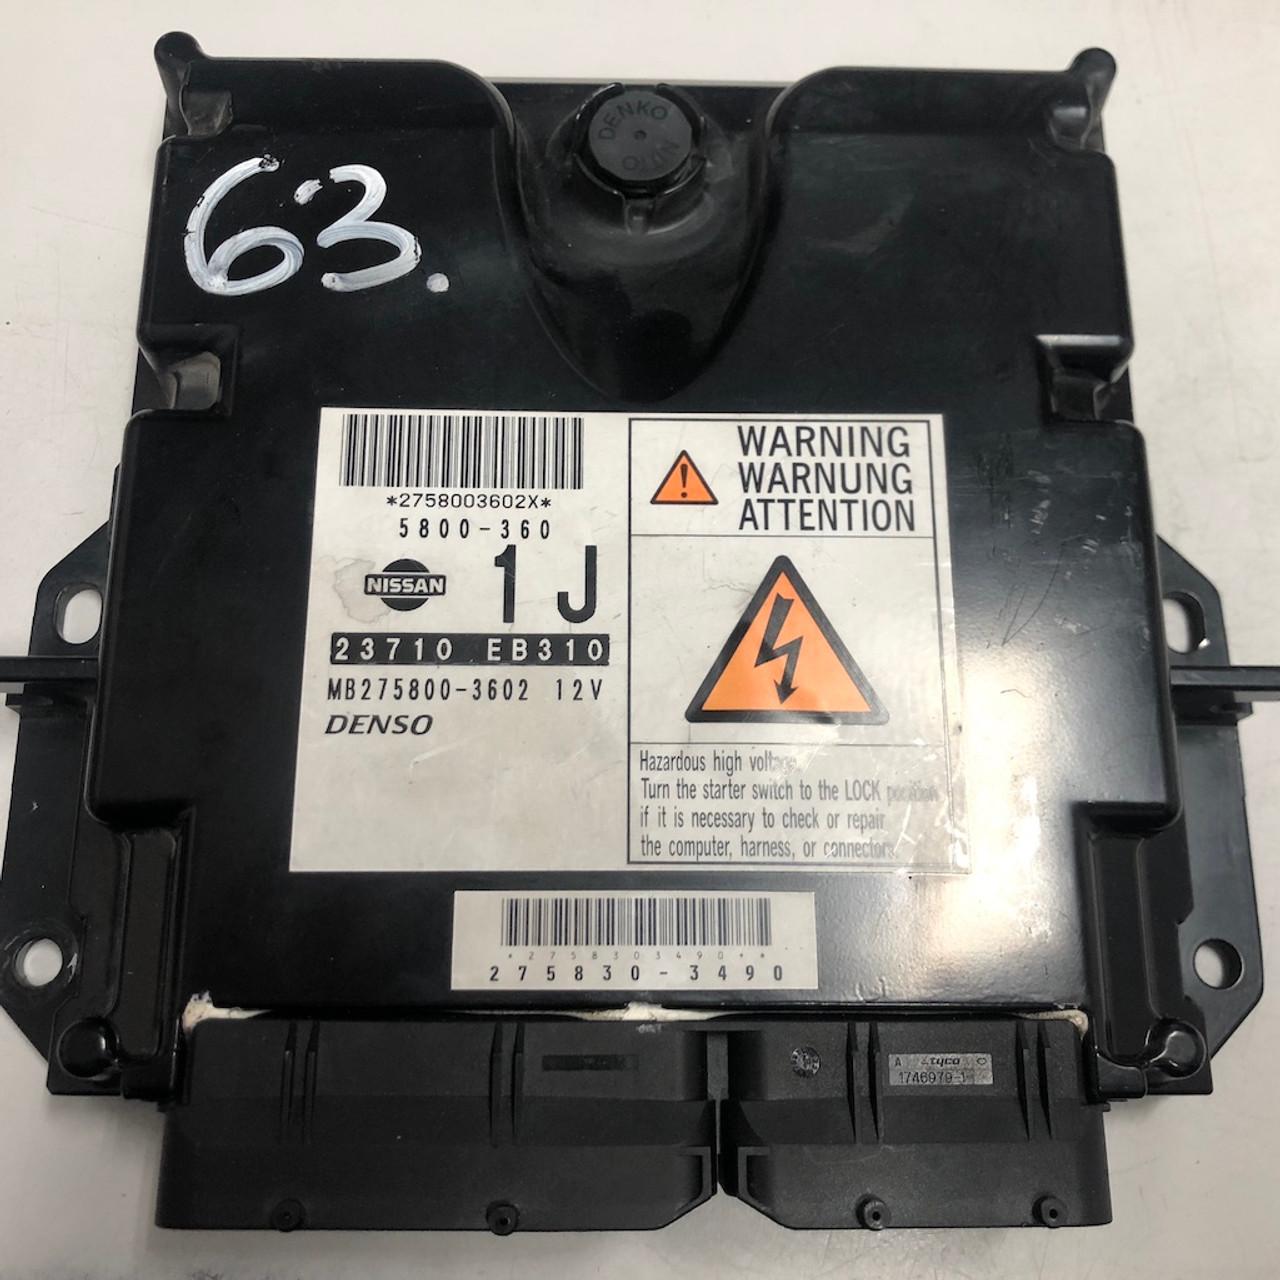 Plug & Play Denso Engine ECU, Nissan Navara 2 5DCi, 23710 EB310,  MB275800-3602 12V, 1J